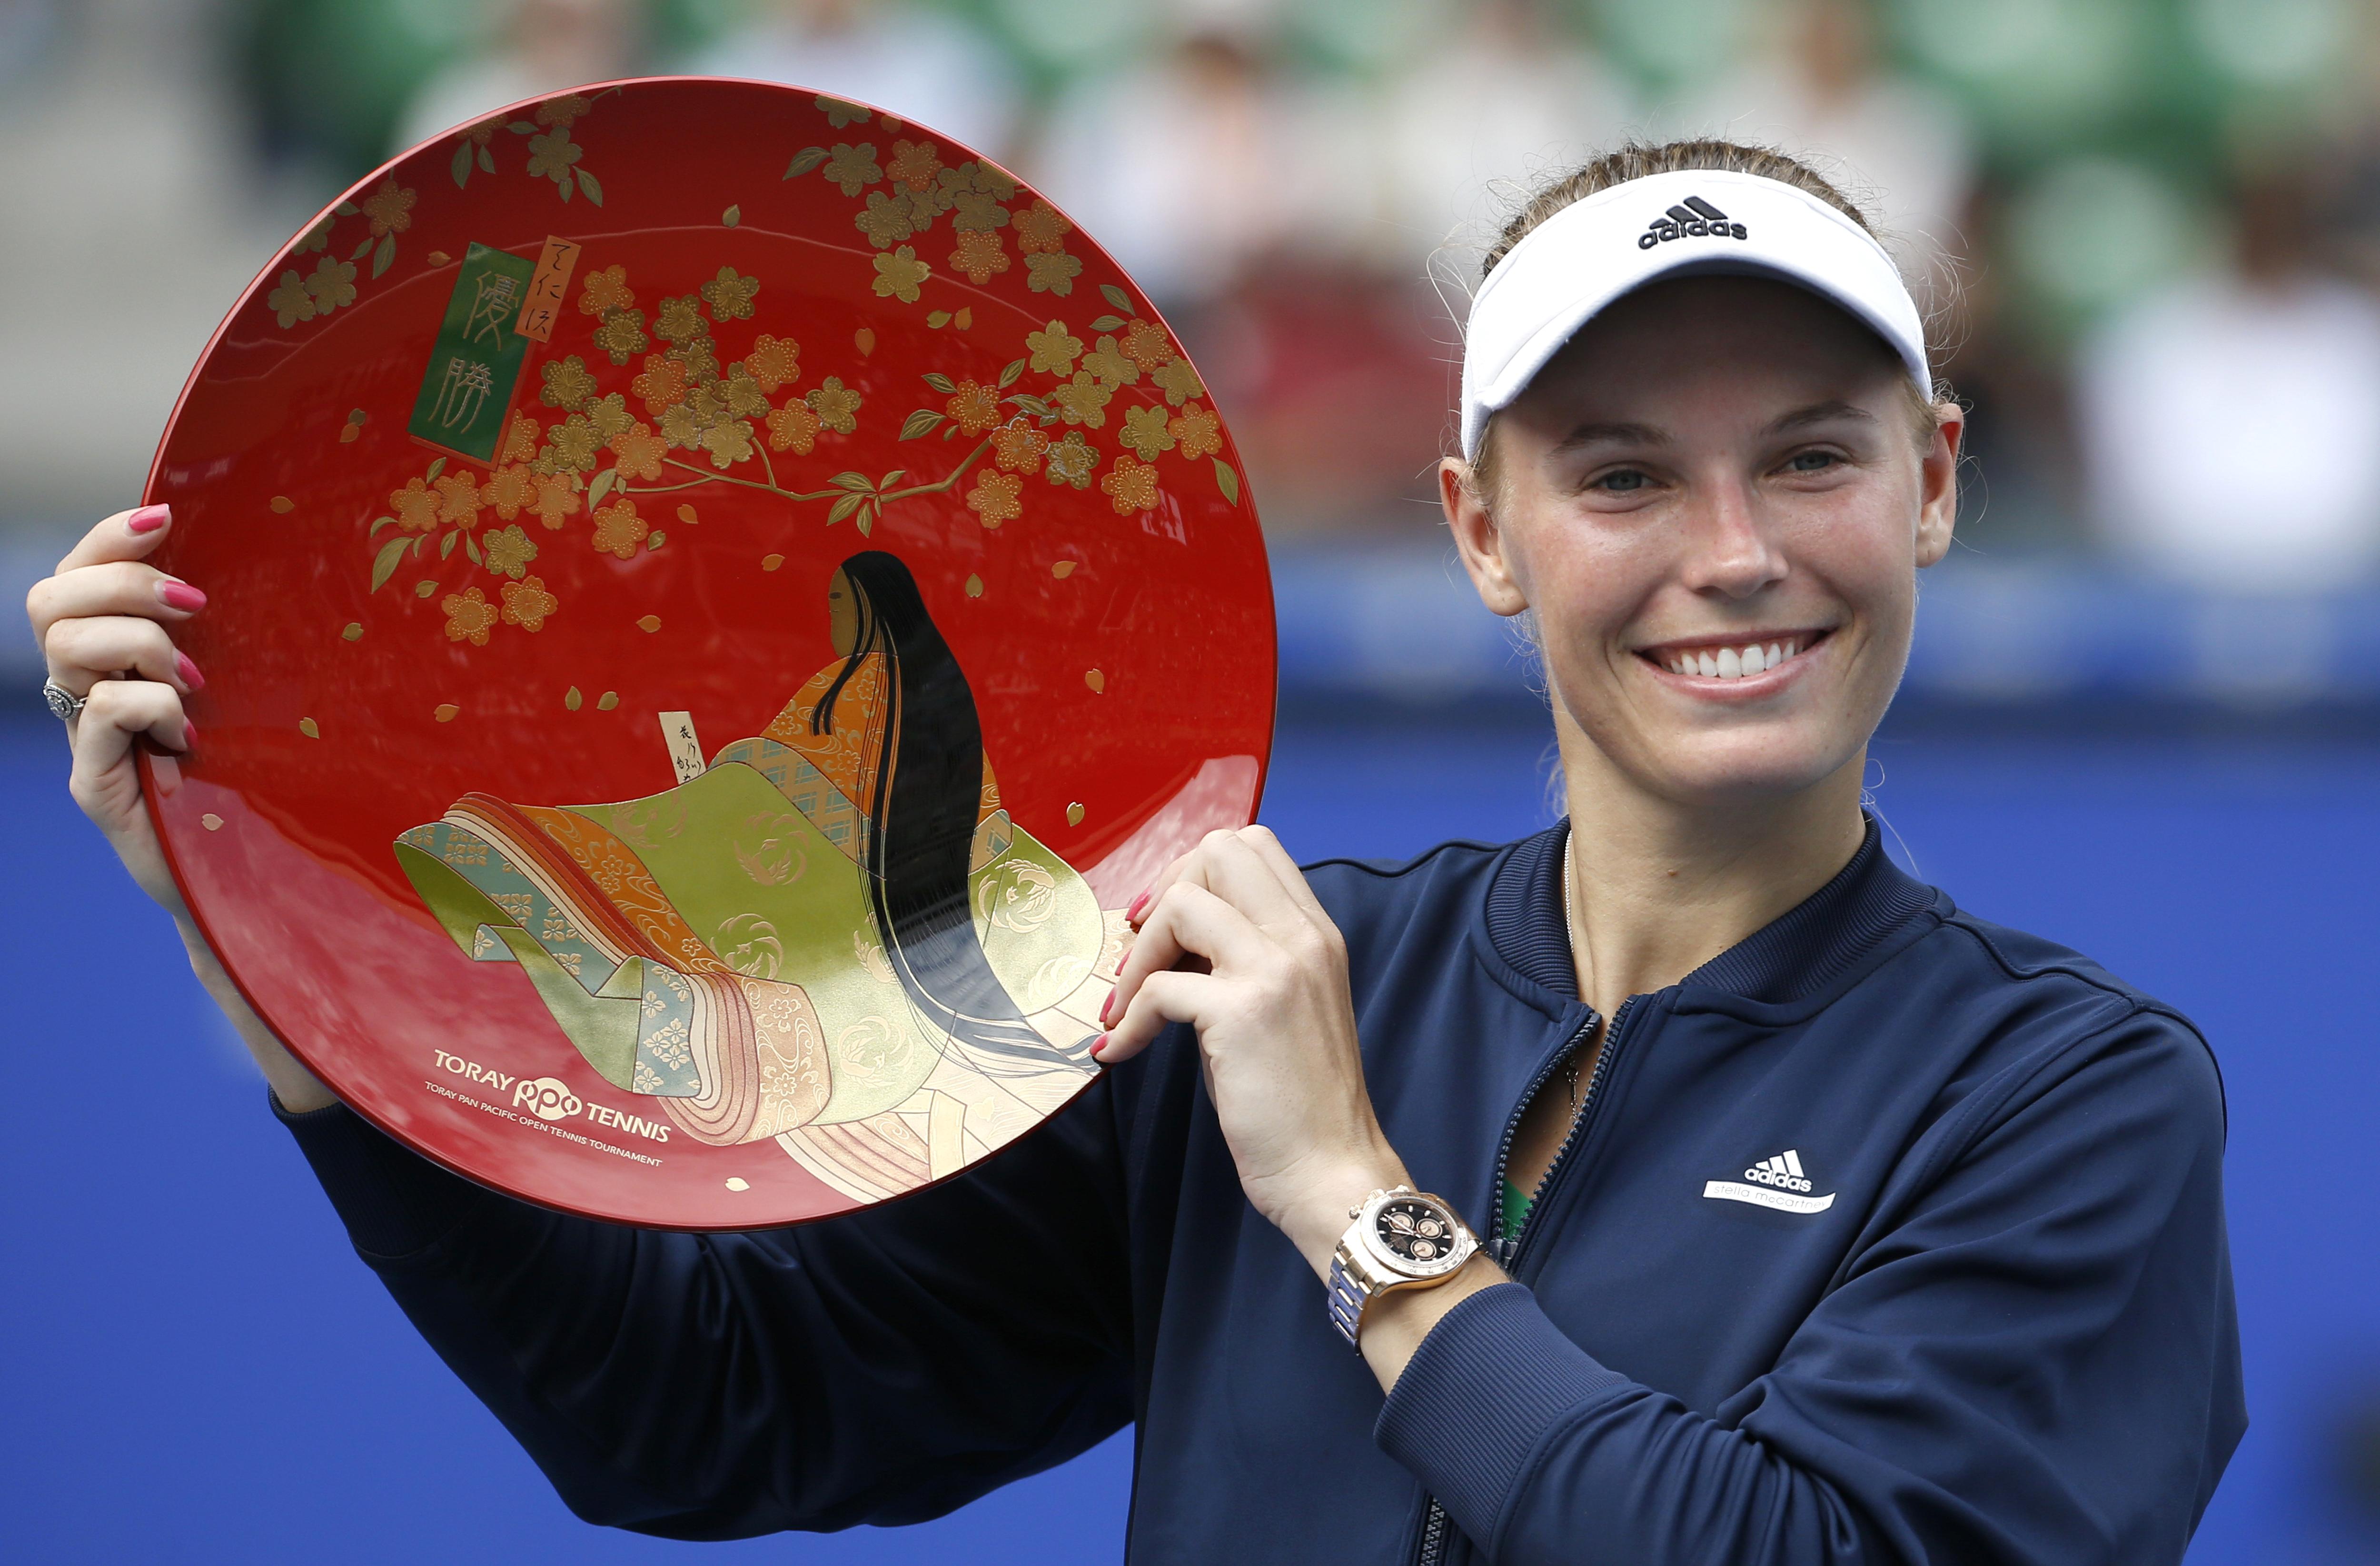 Caroline Wozniacki of Denmark poses with the winner's plate after beating Naomi Osaka of Japan at the Japan Pan Pacific Open tennis tournament in Tokyo, Sunday, Sept. 25, 2016. (AP Photo/Shizuo Kambayashi)